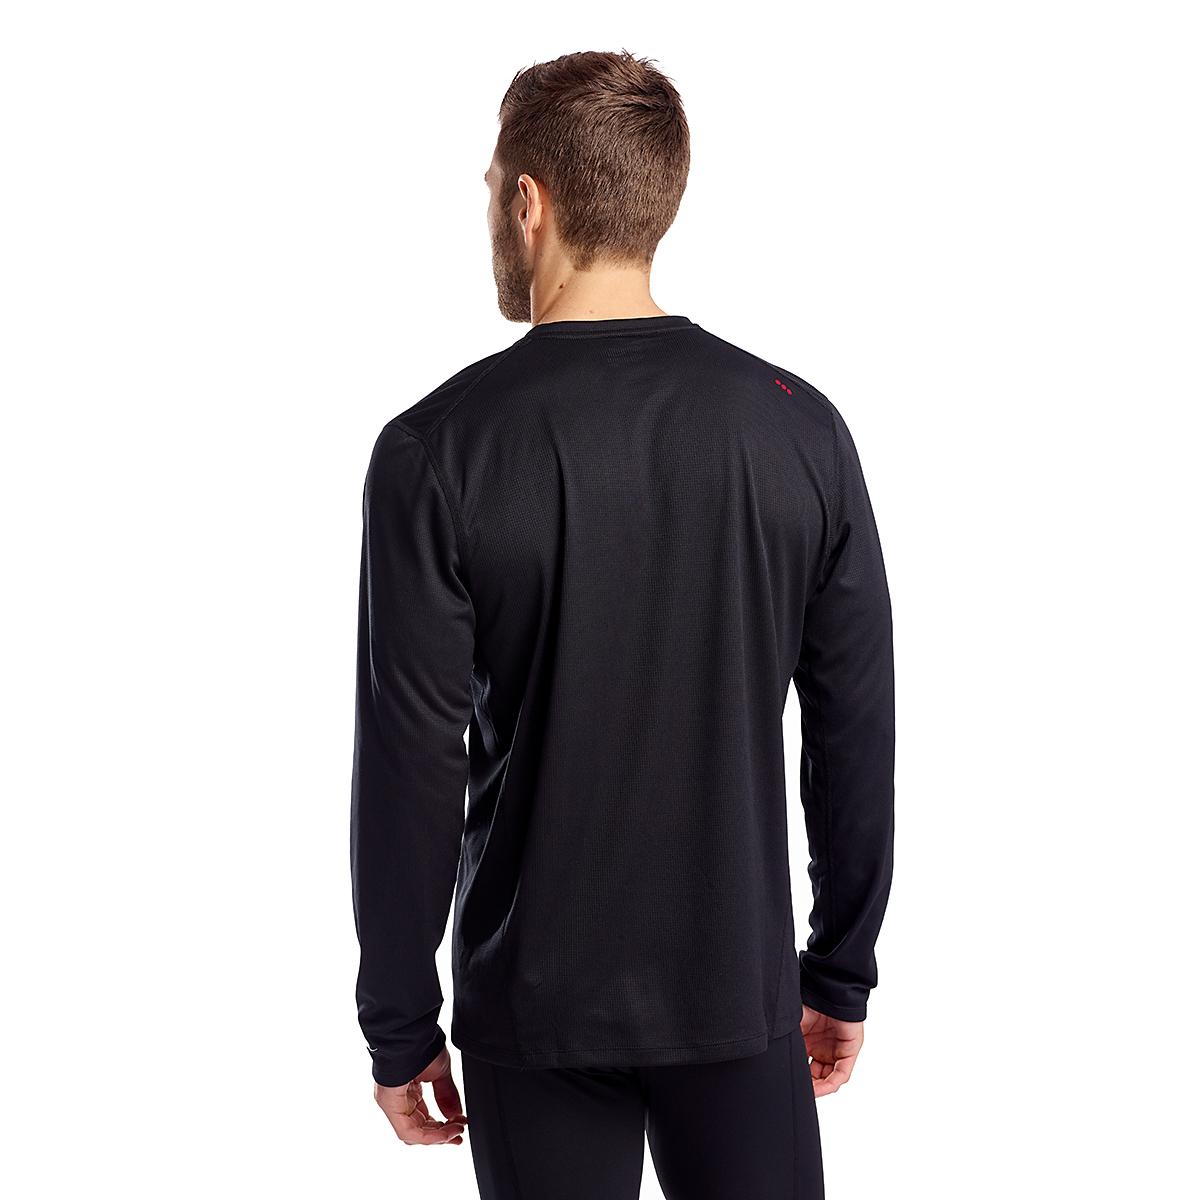 Men's Saucony Stopwatch Long Sleeve - Color: Black - Size: S, Black, large, image 2